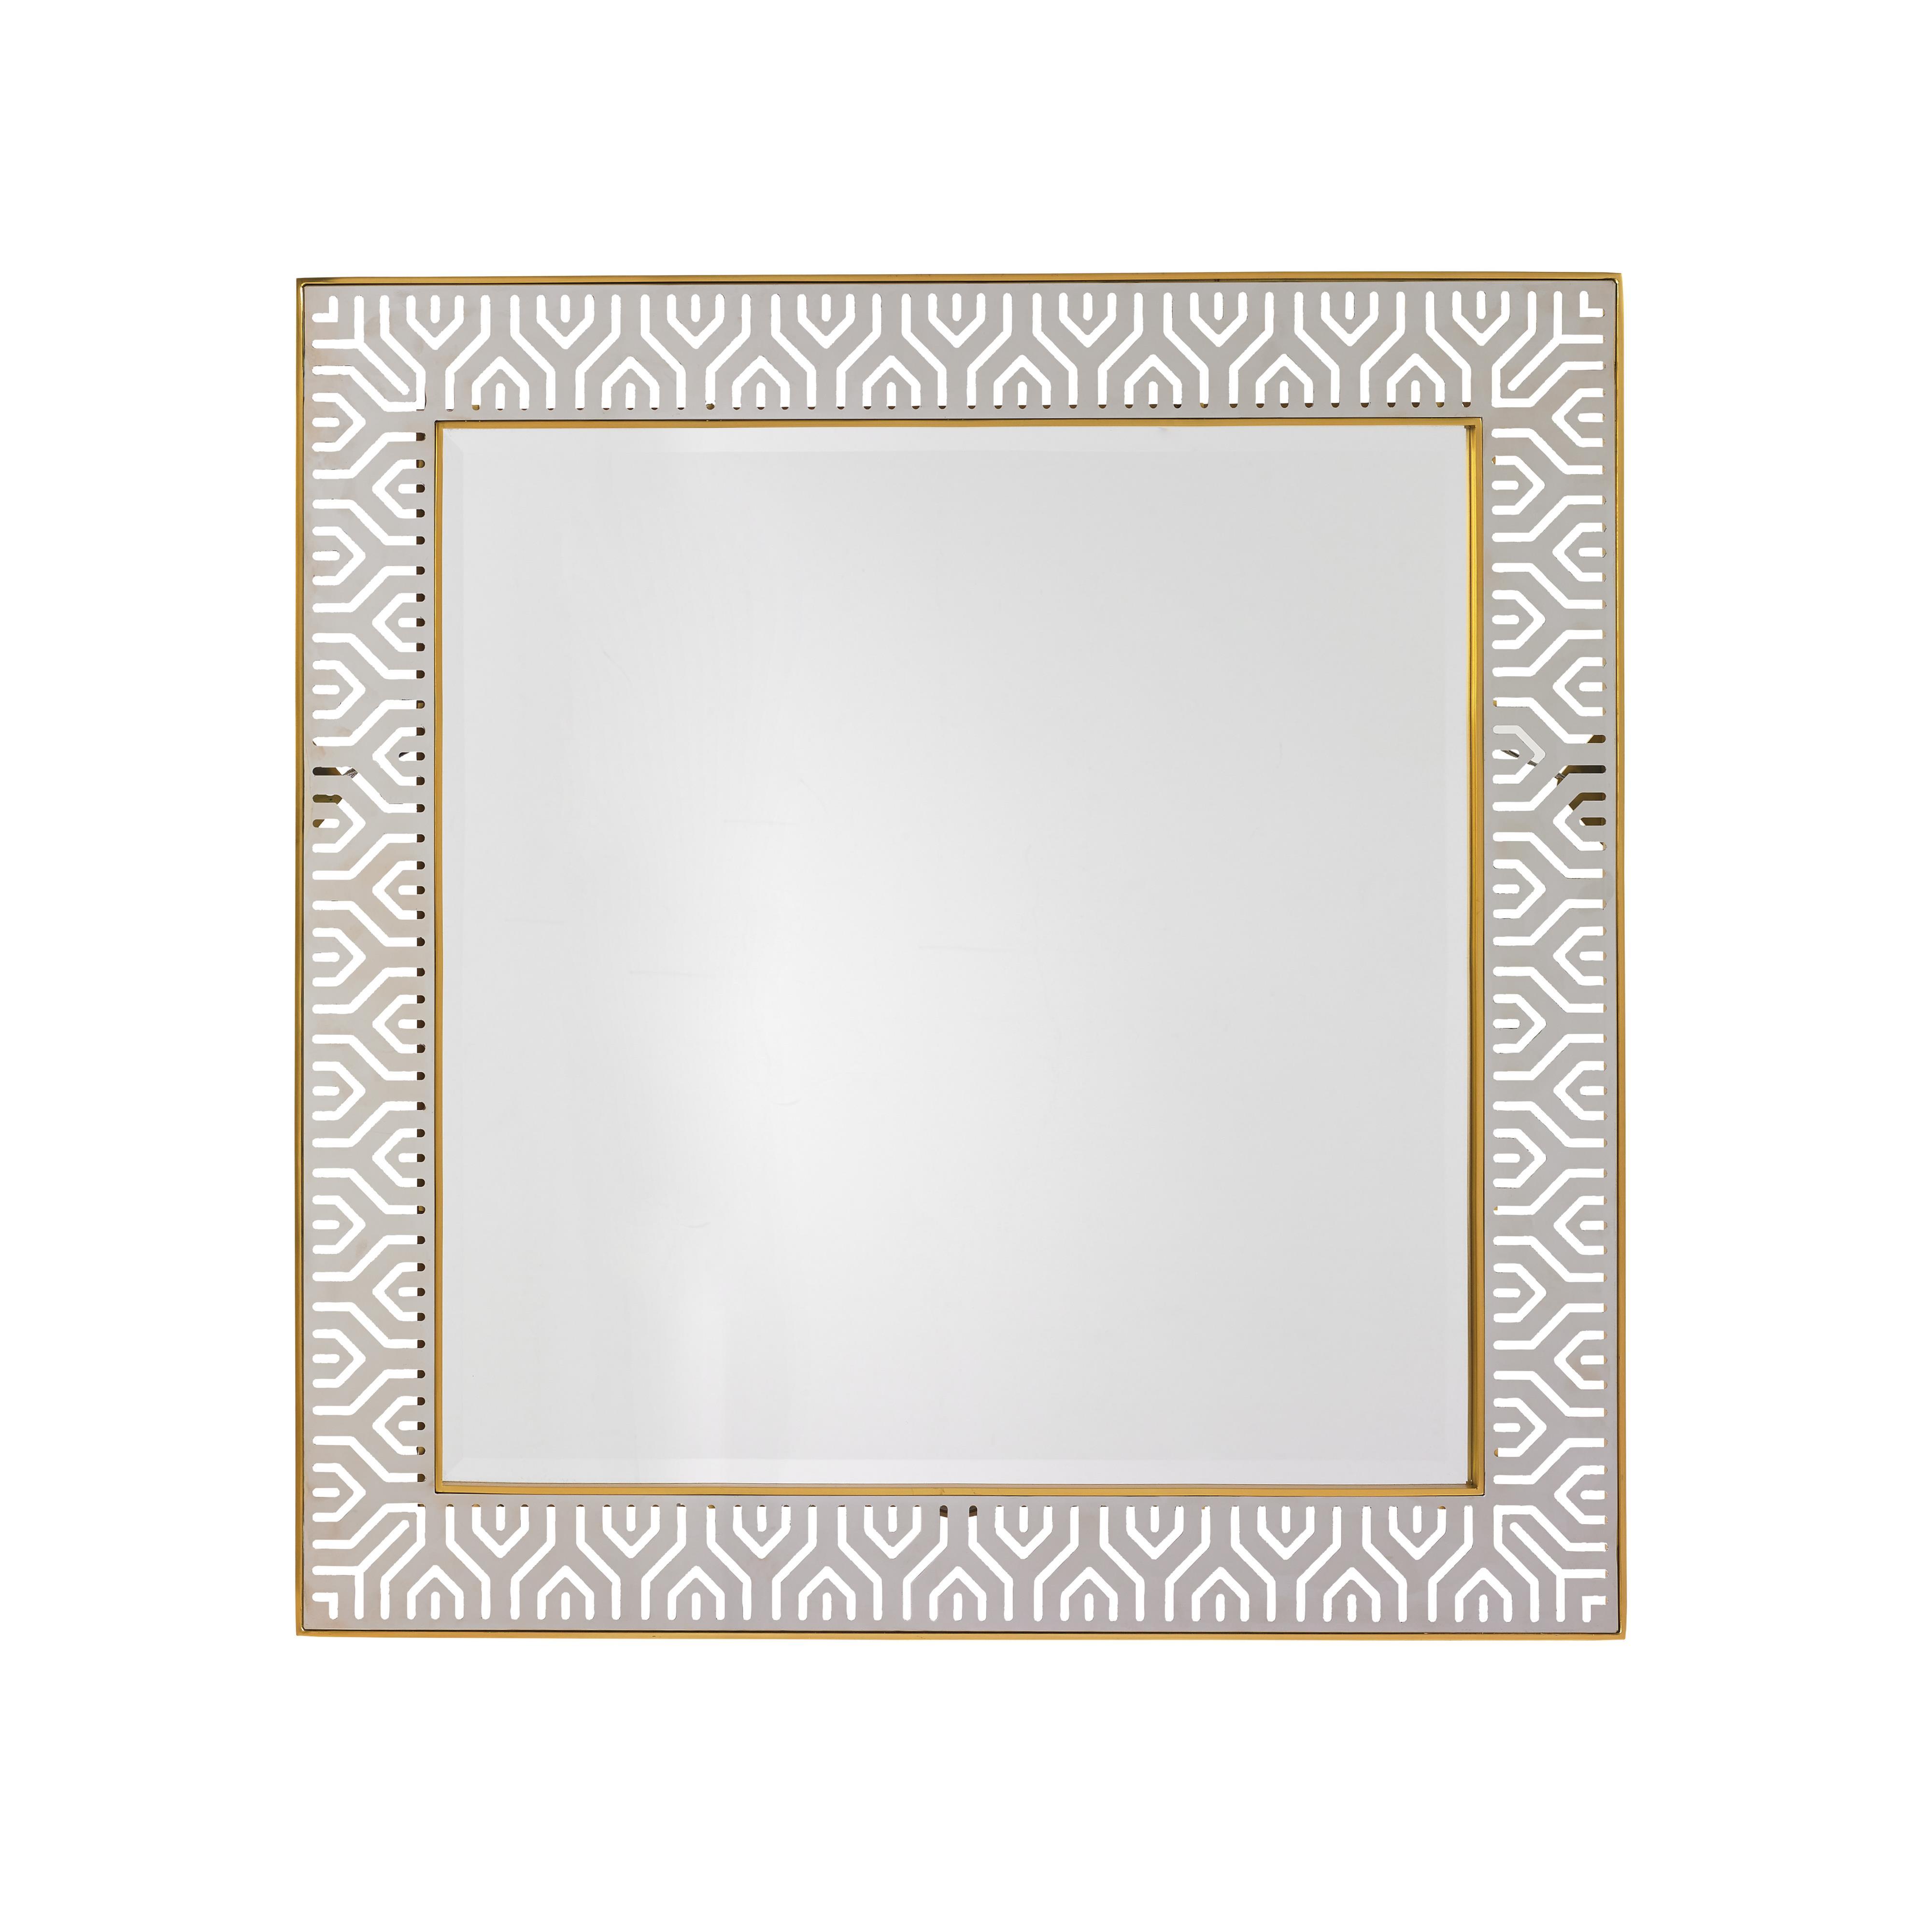 Lexington TAKE FIVE Tribeca Square Mirror - Item Number: 723-205